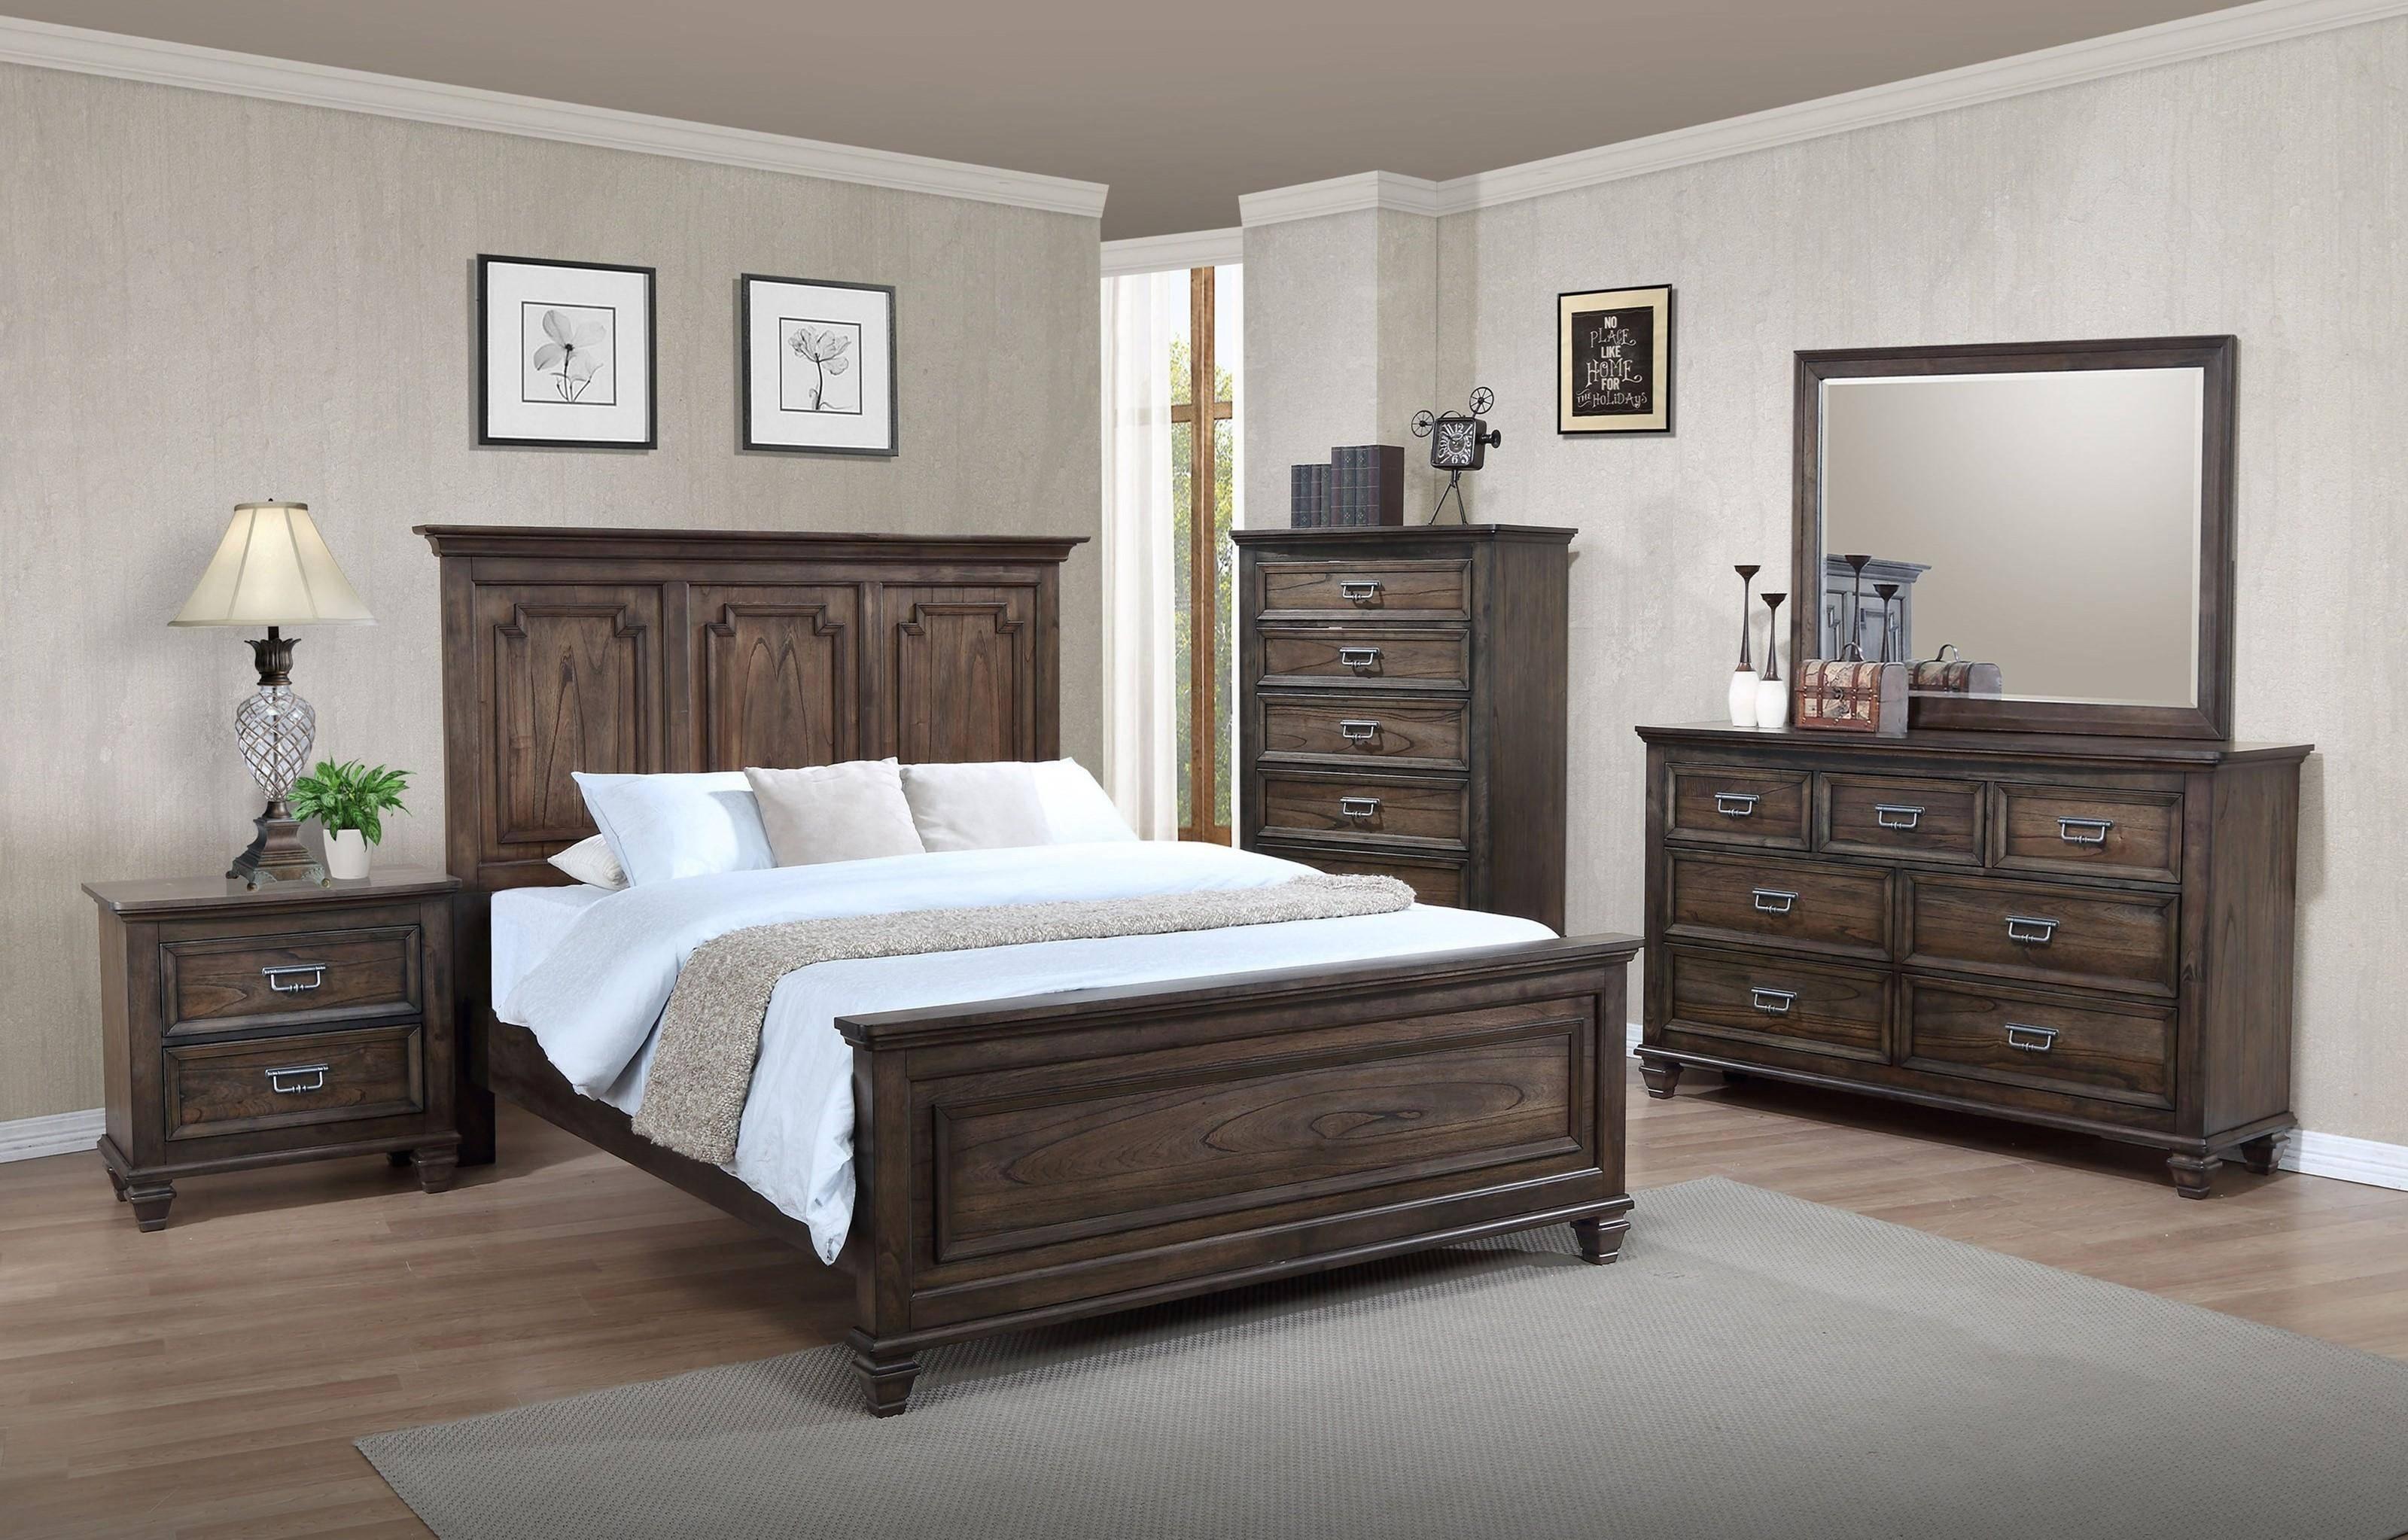 crown mark b8250 campbell king panel bedroom set 5 pcs in brown gray wood solids and veneer